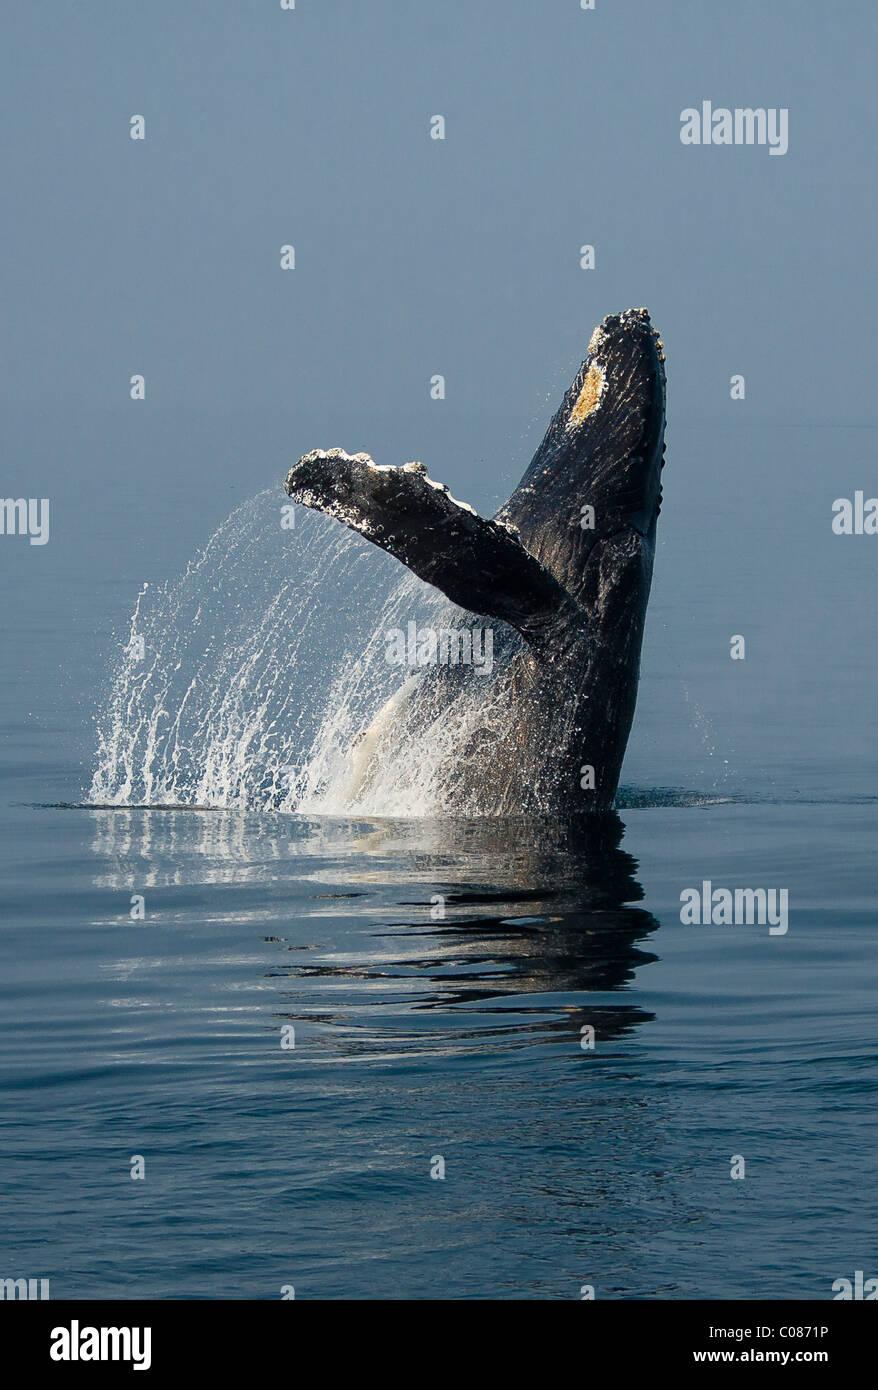 Humpback Whale breaching in display, Alaska, USA - Stock Image